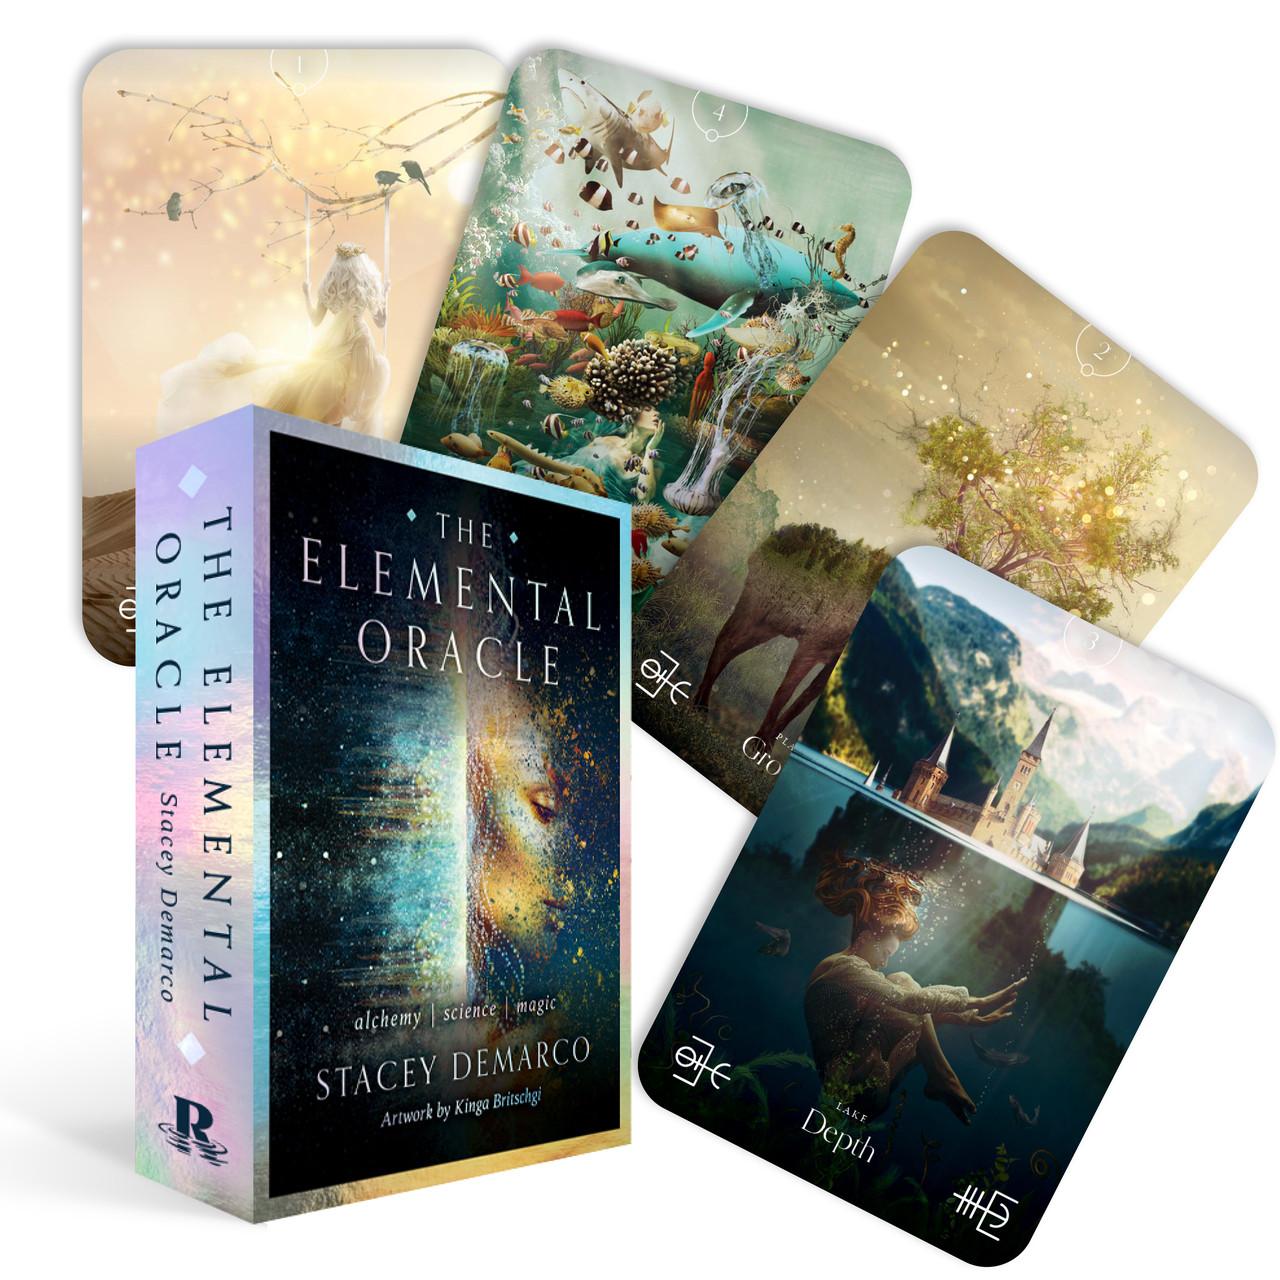 The Elemental Oracle/ Елементний Оракул